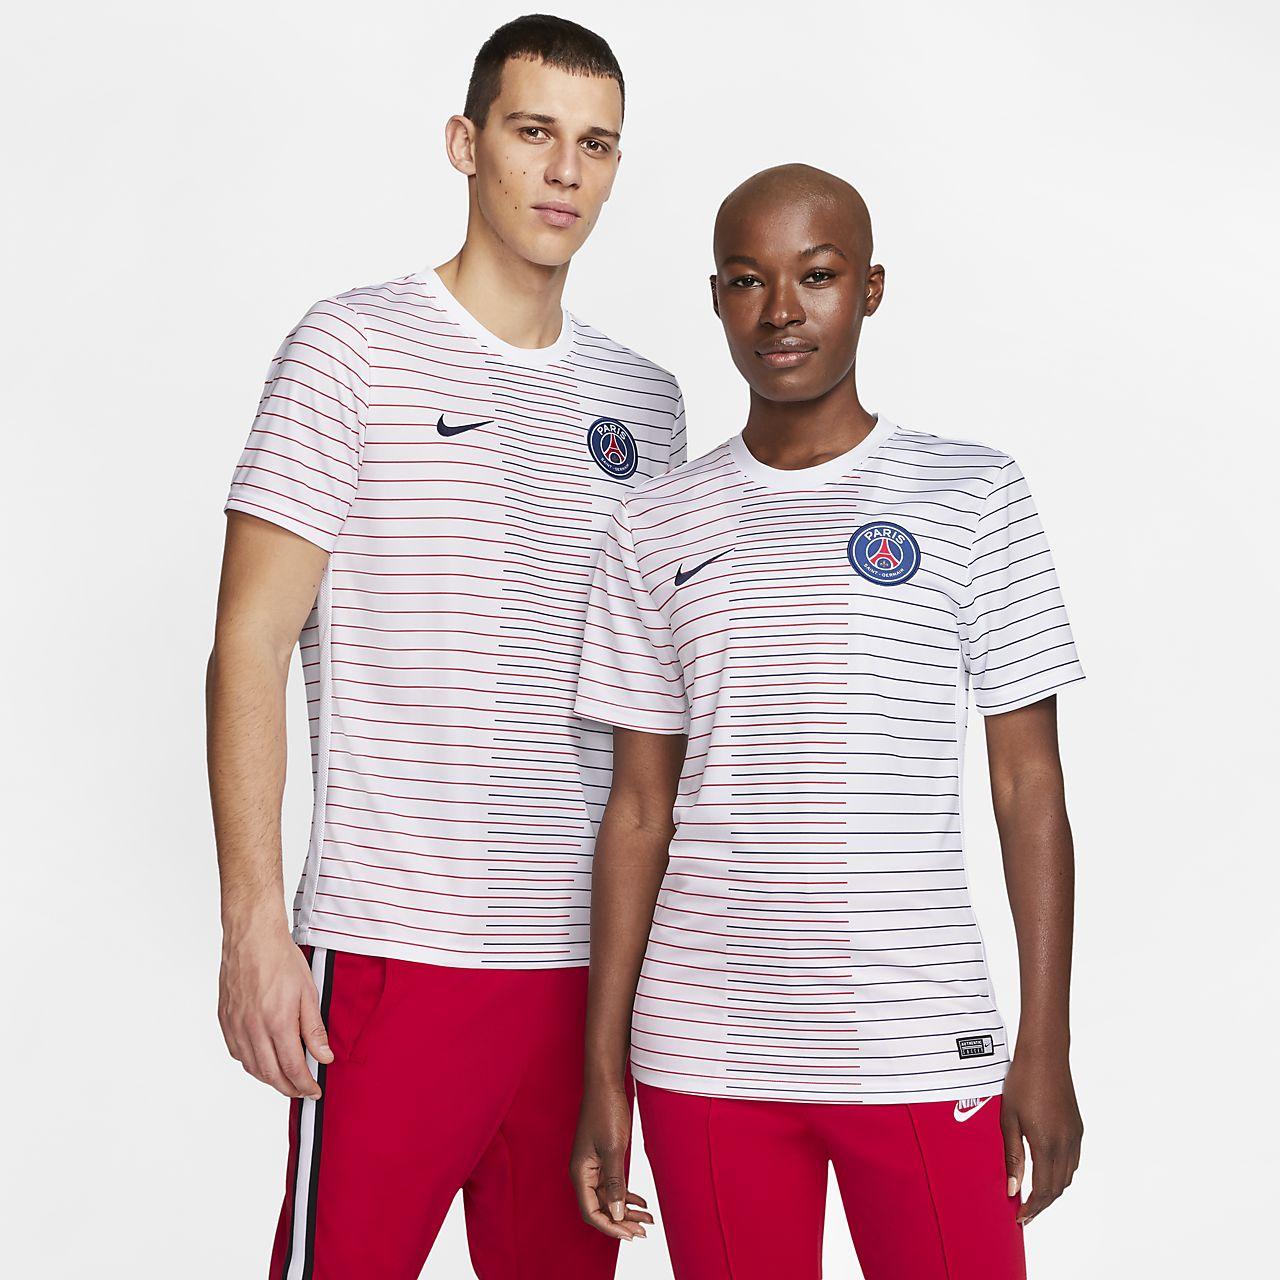 e423a570a84f7a Męska koszulka piłkarska z krótkim rękawem Paris Saint-Germain. Nike ...